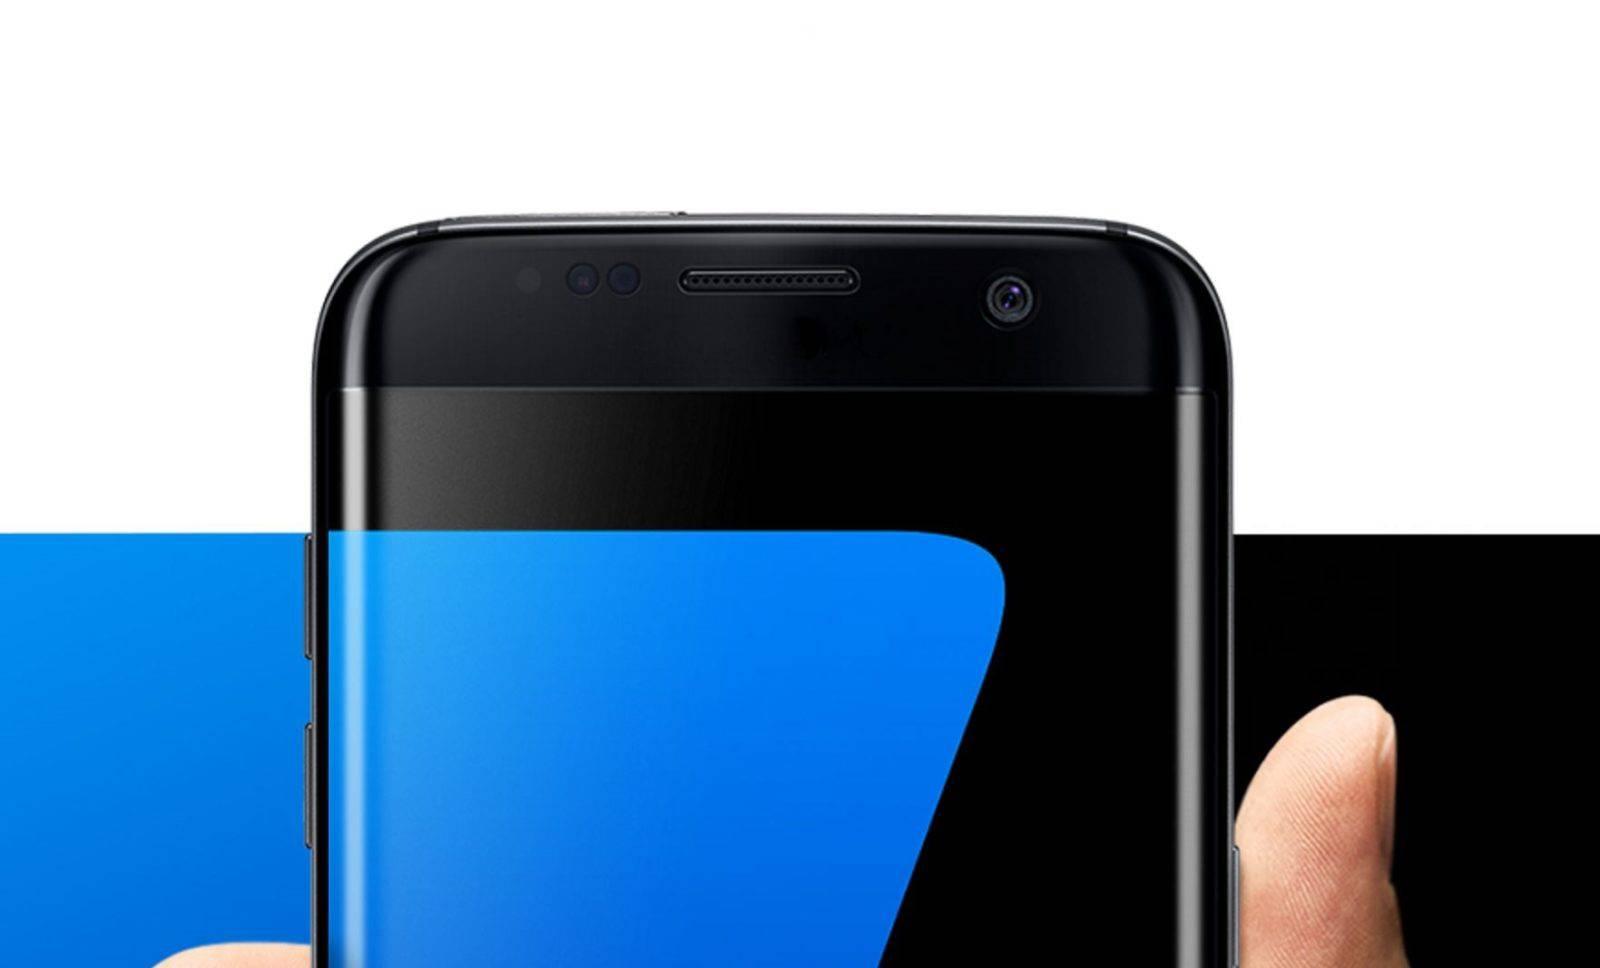 Galaxy S7 no front logo